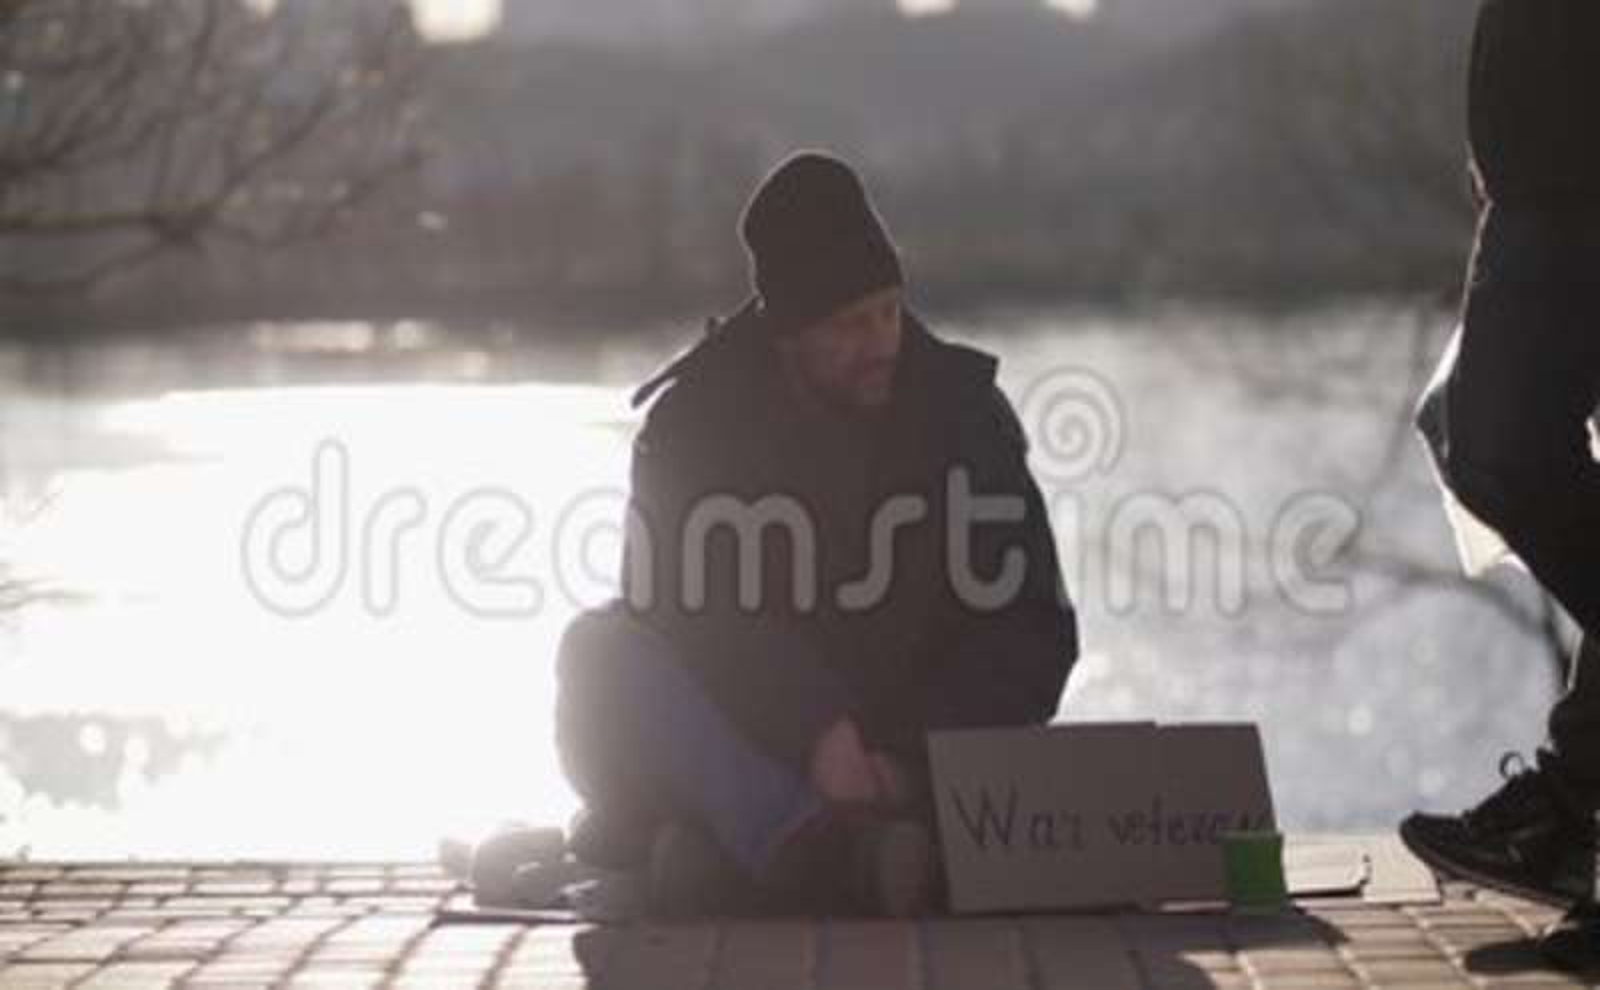 Essay on evils of street begging